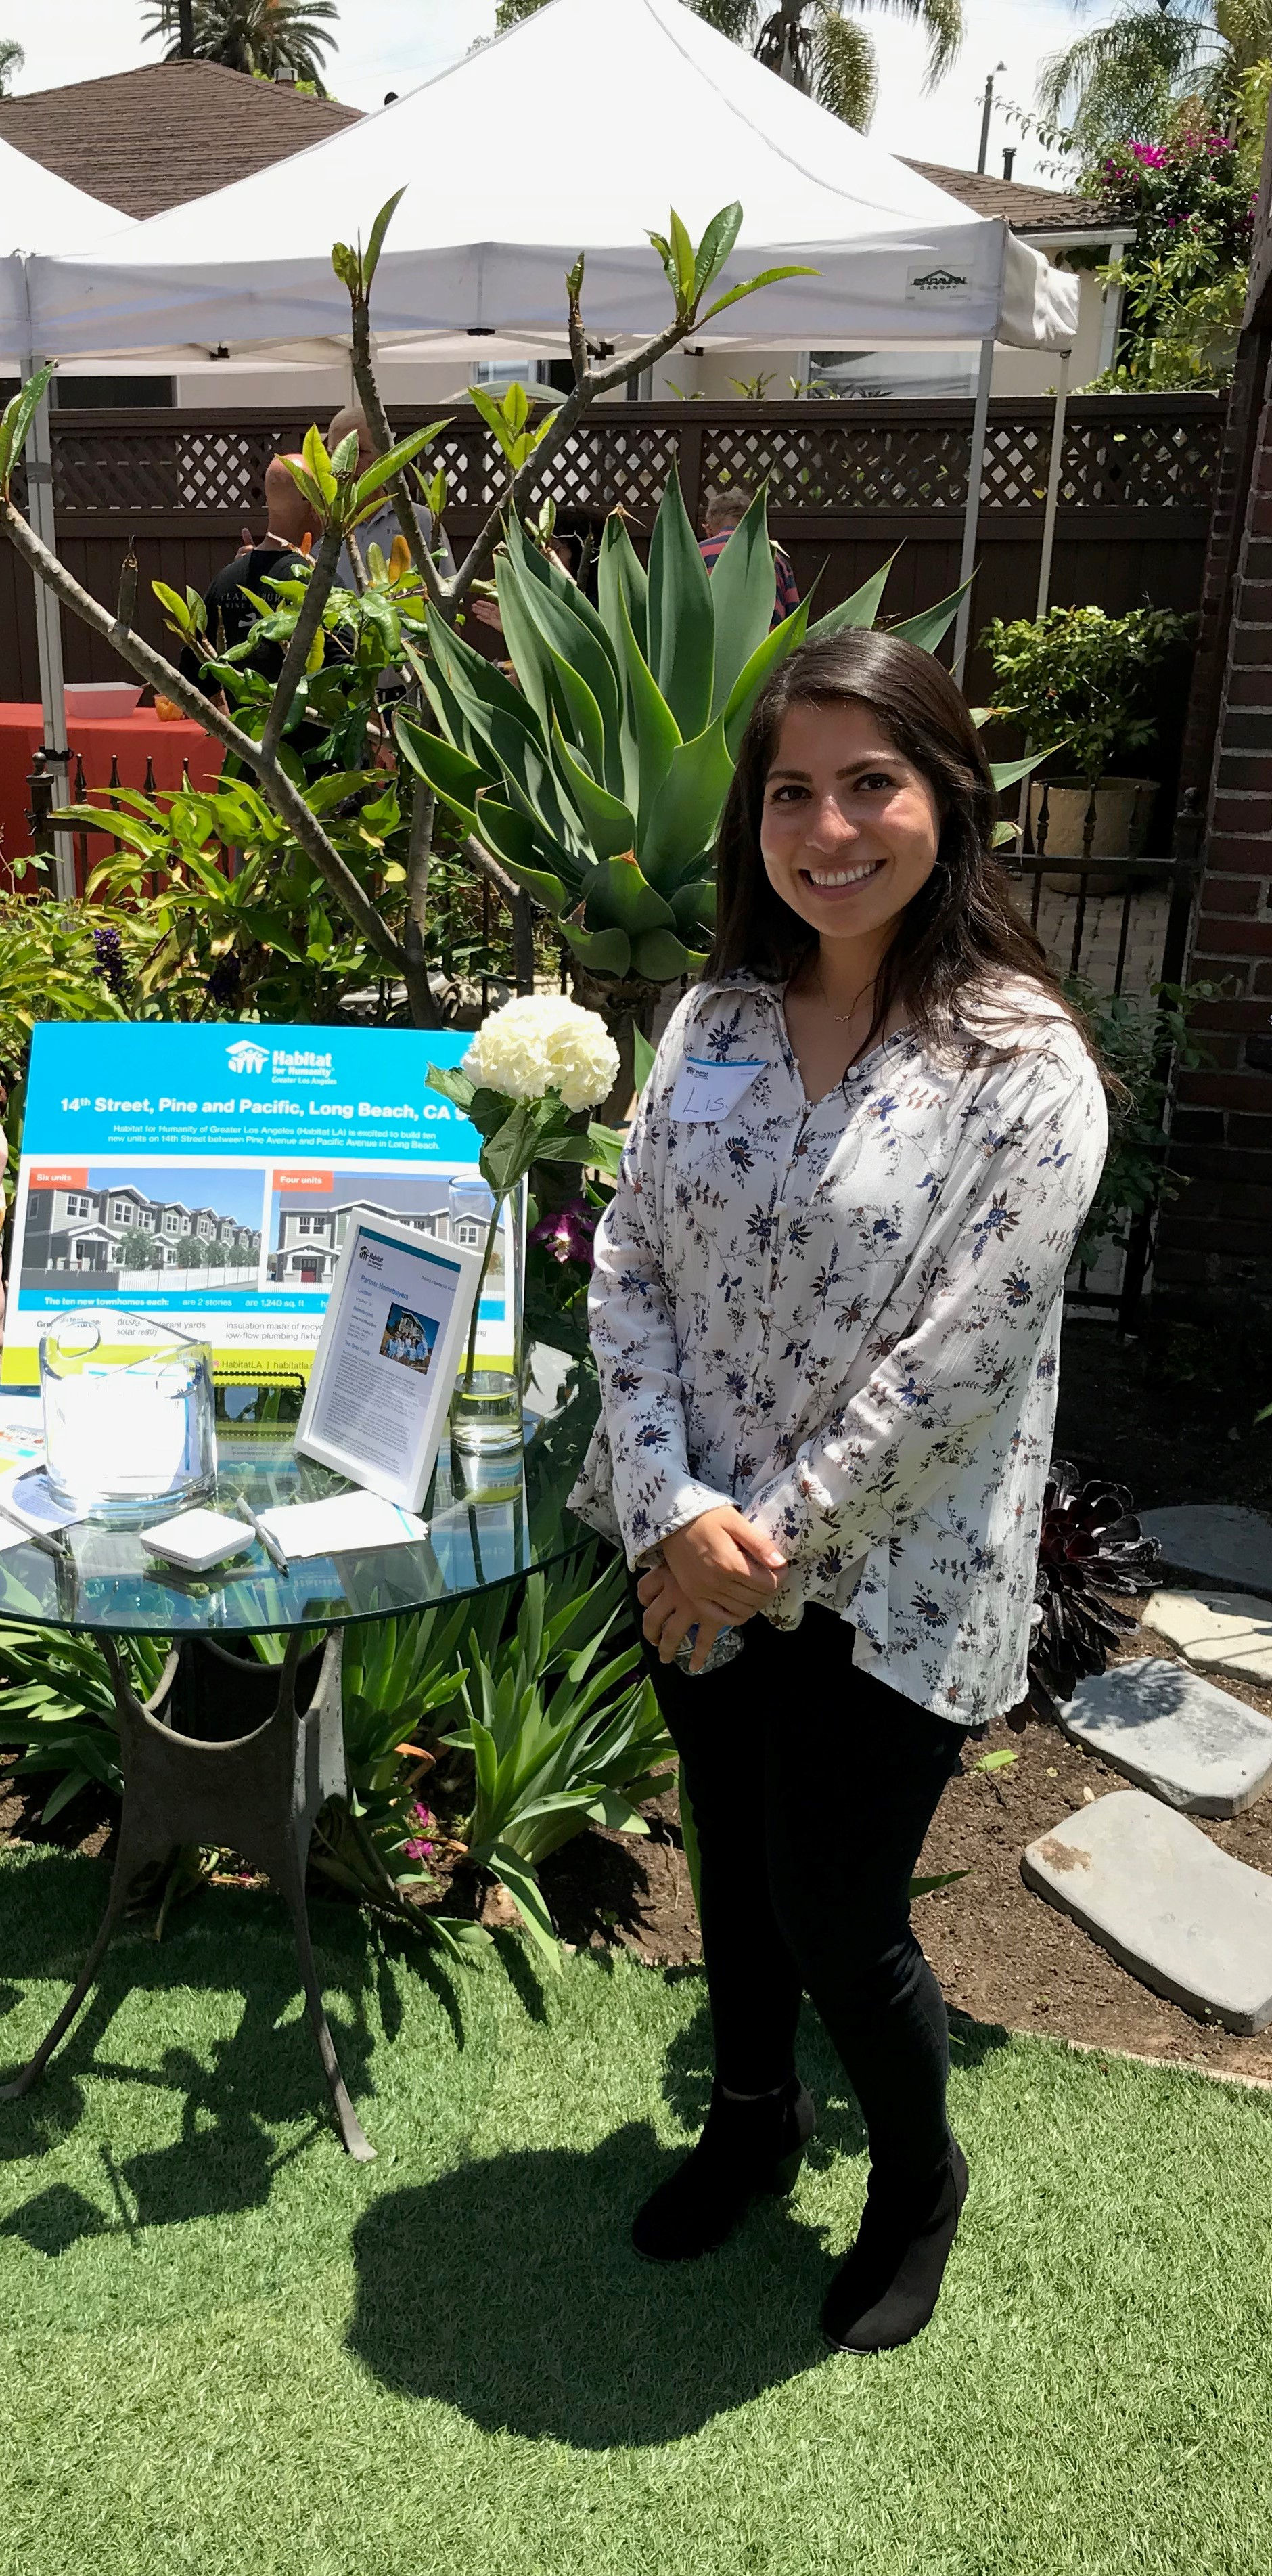 Lisa Homeidan smiling in front of a Habitat LA display table.